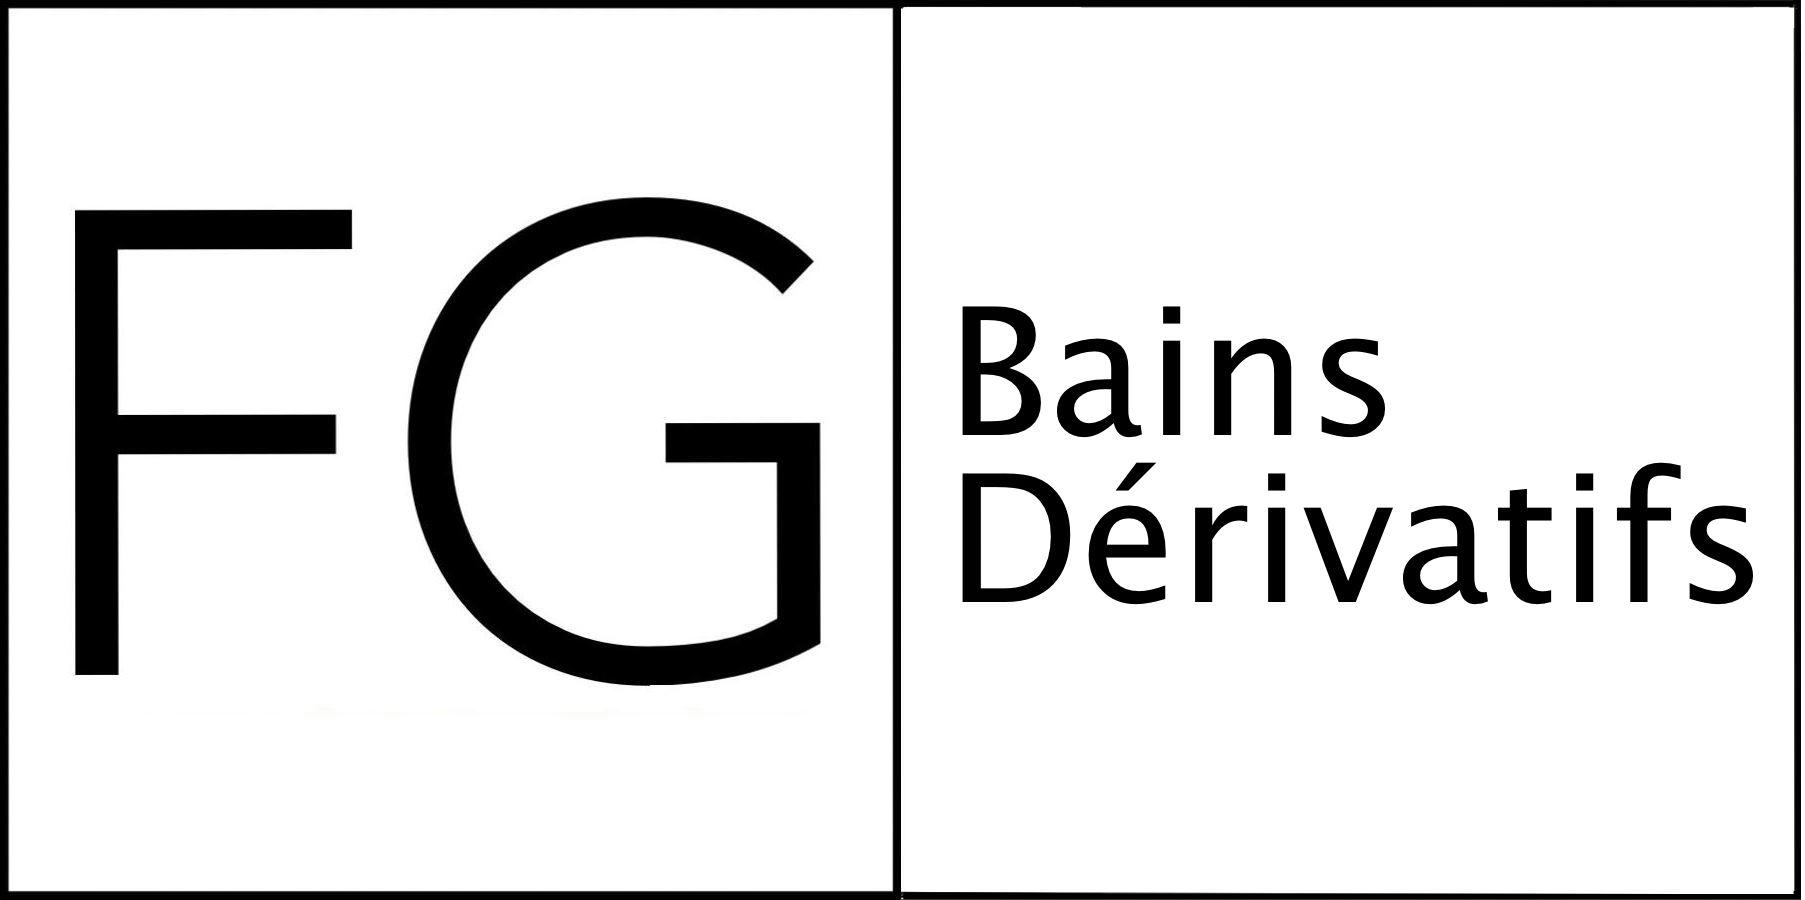 Bains dérivatifs et Méthode France Guillain